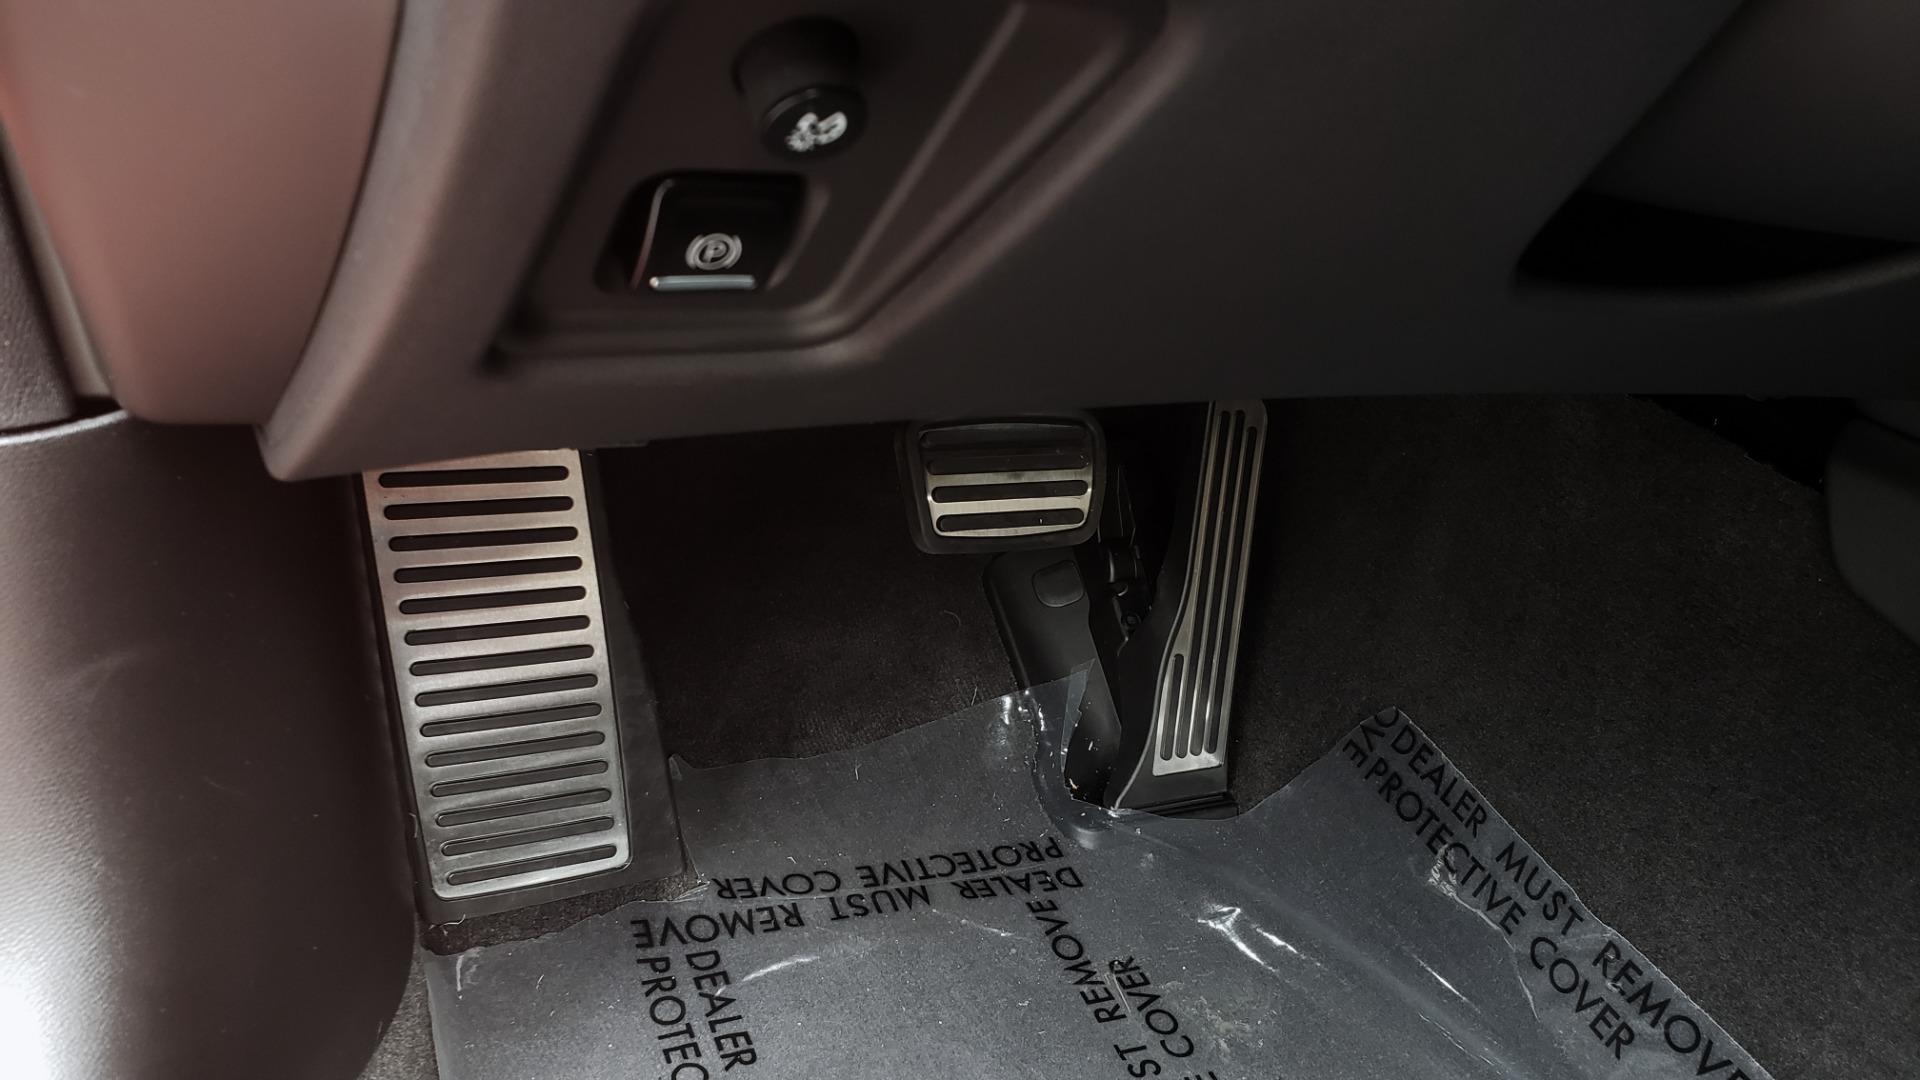 Used 2020 Chevrolet CORVETTE C8 STINGRAY 2LT / 6.2L V8 / 8-SPD AUTO / NAV / BOSE / REARVIEW / DATA RECOR for sale Sold at Formula Imports in Charlotte NC 28227 47